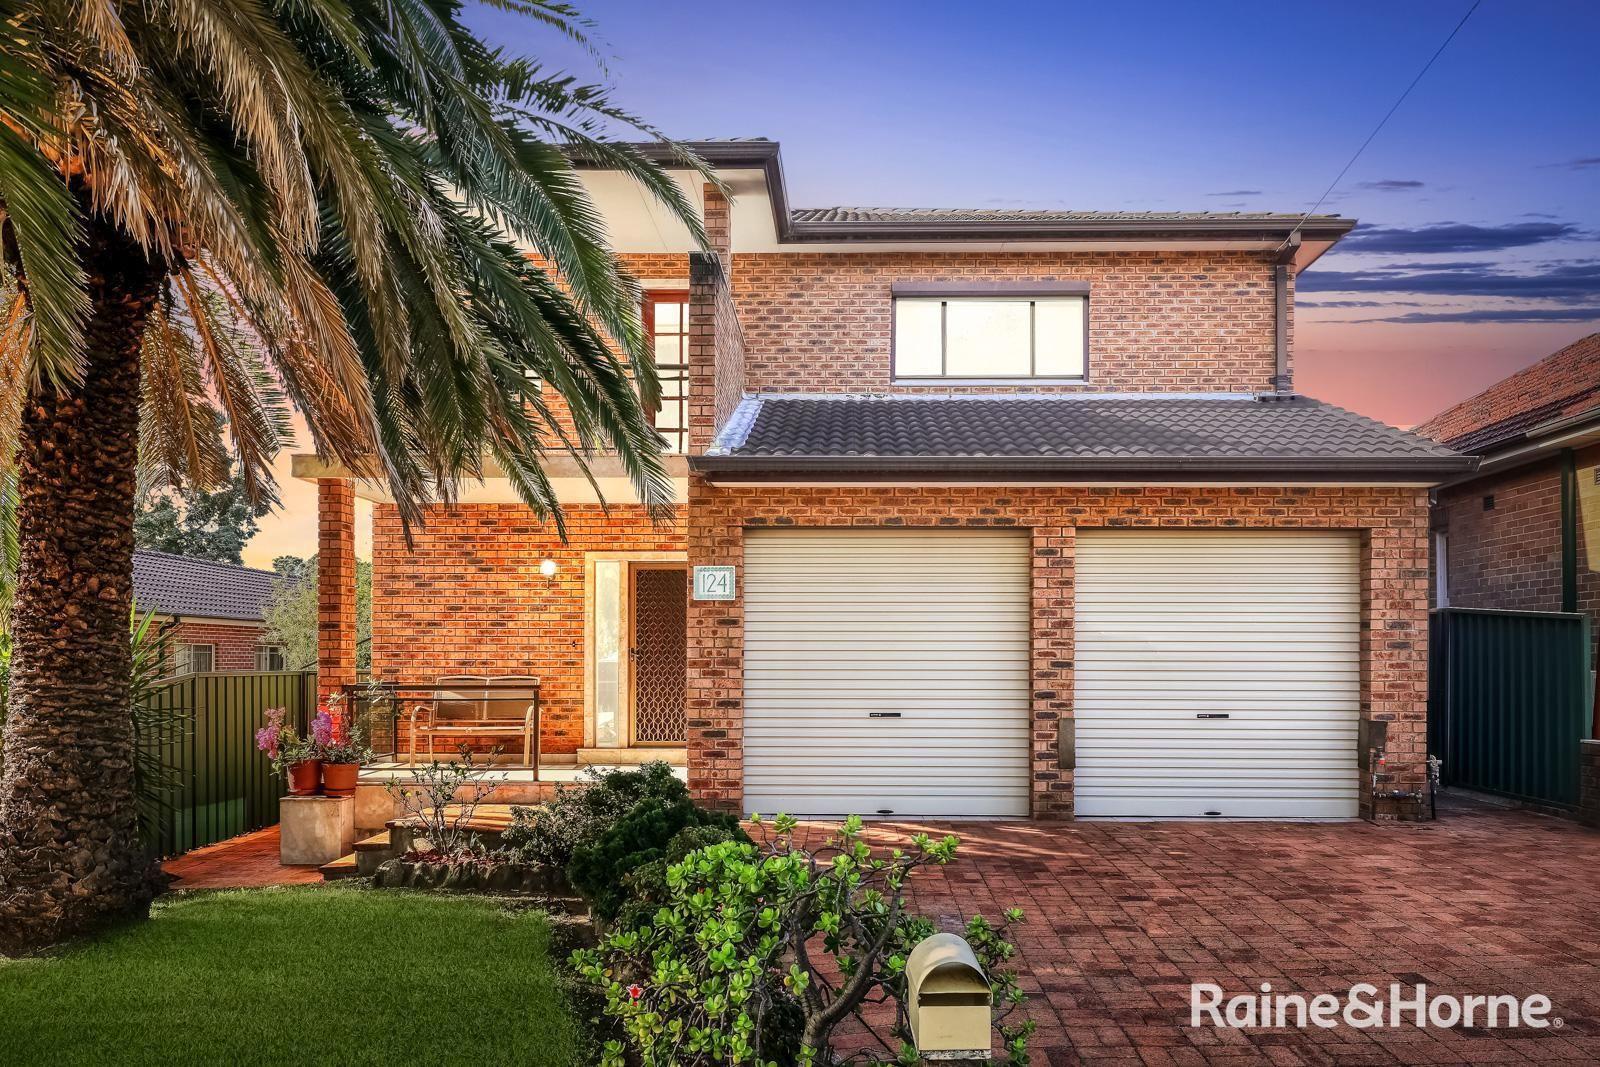 124 Staples Street, Kingsgrove NSW 2208, Image 0